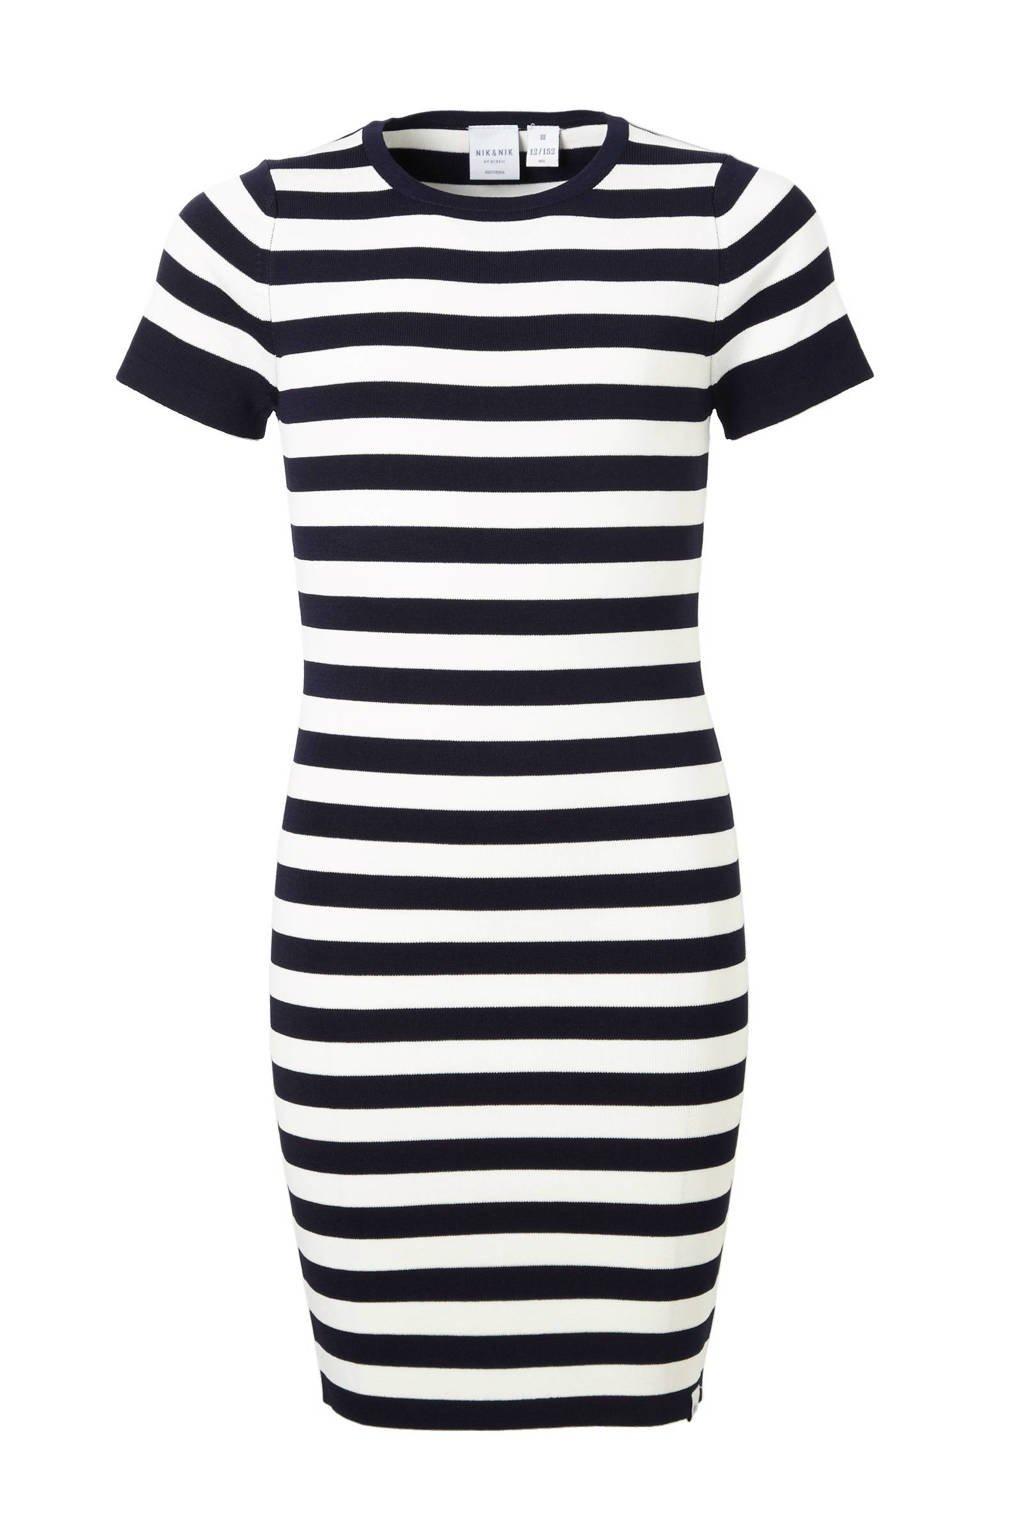 NIK&NIK jurk Jolie d.blauw/offwhite, Donkerblauw/offwhite